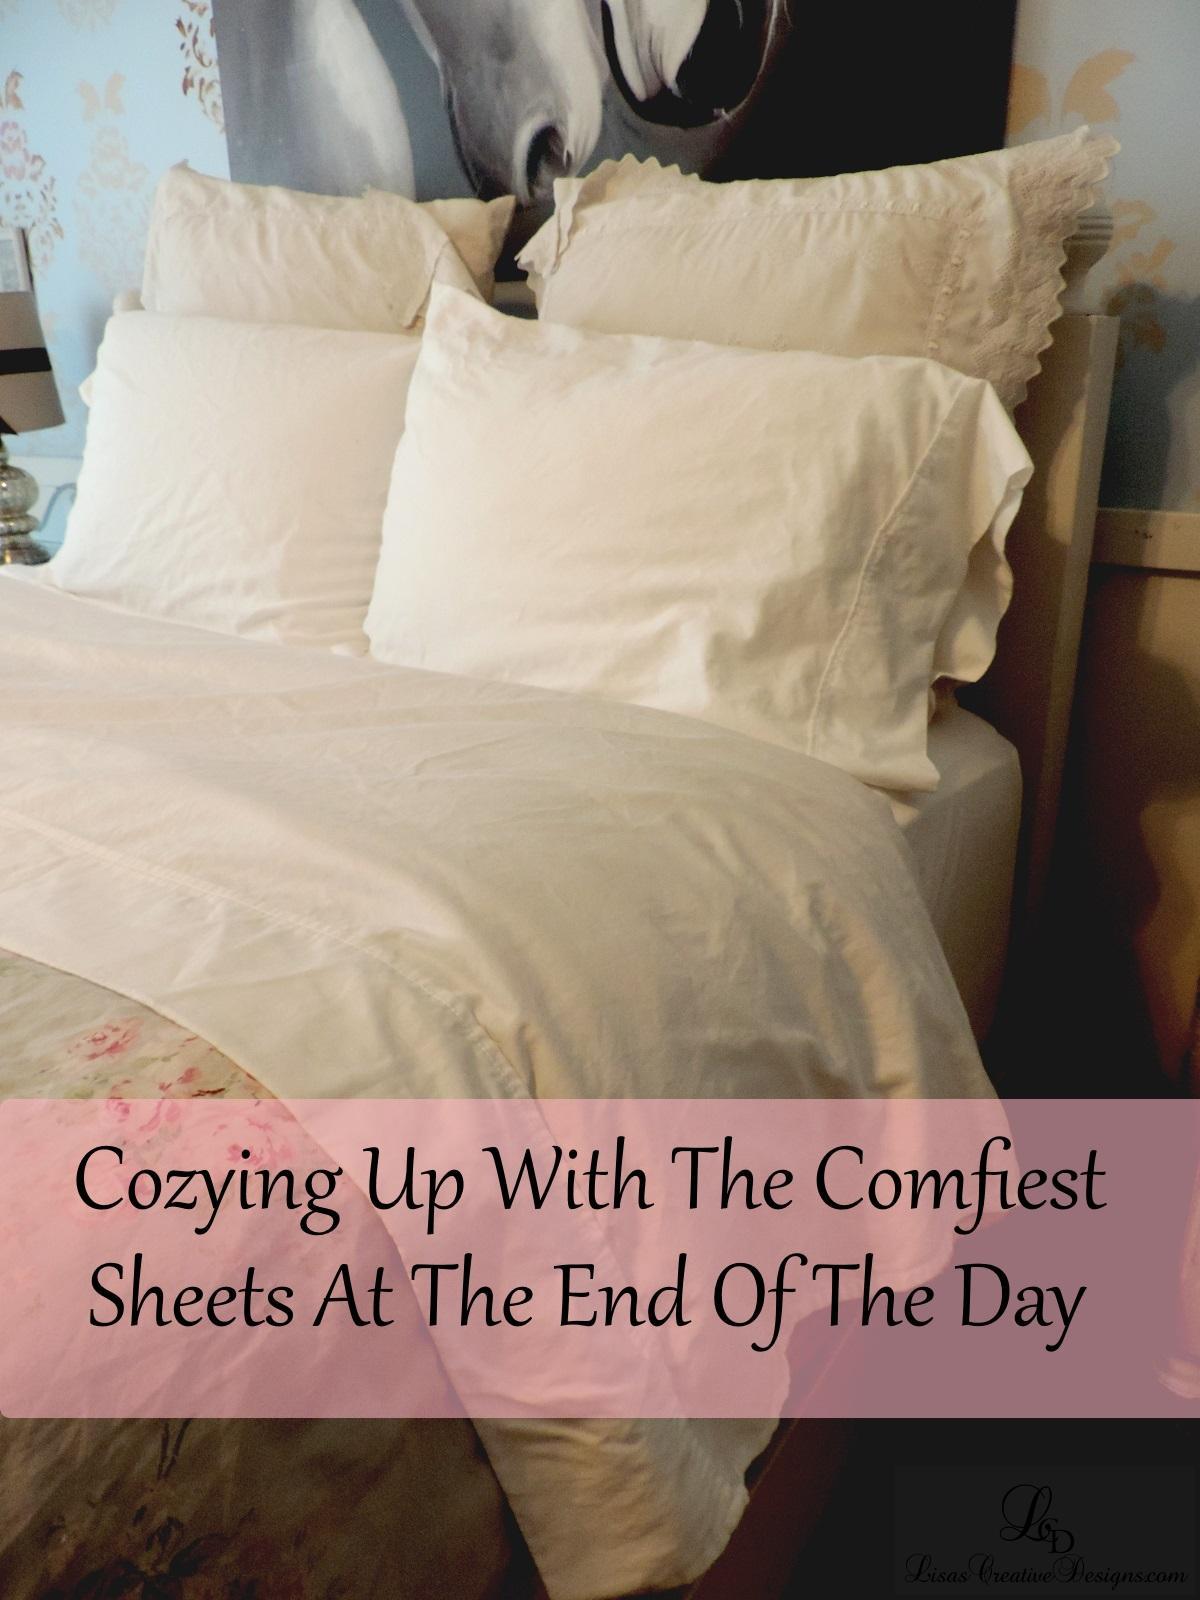 The Comfiest Sheets By Carolina Design Den Jpg